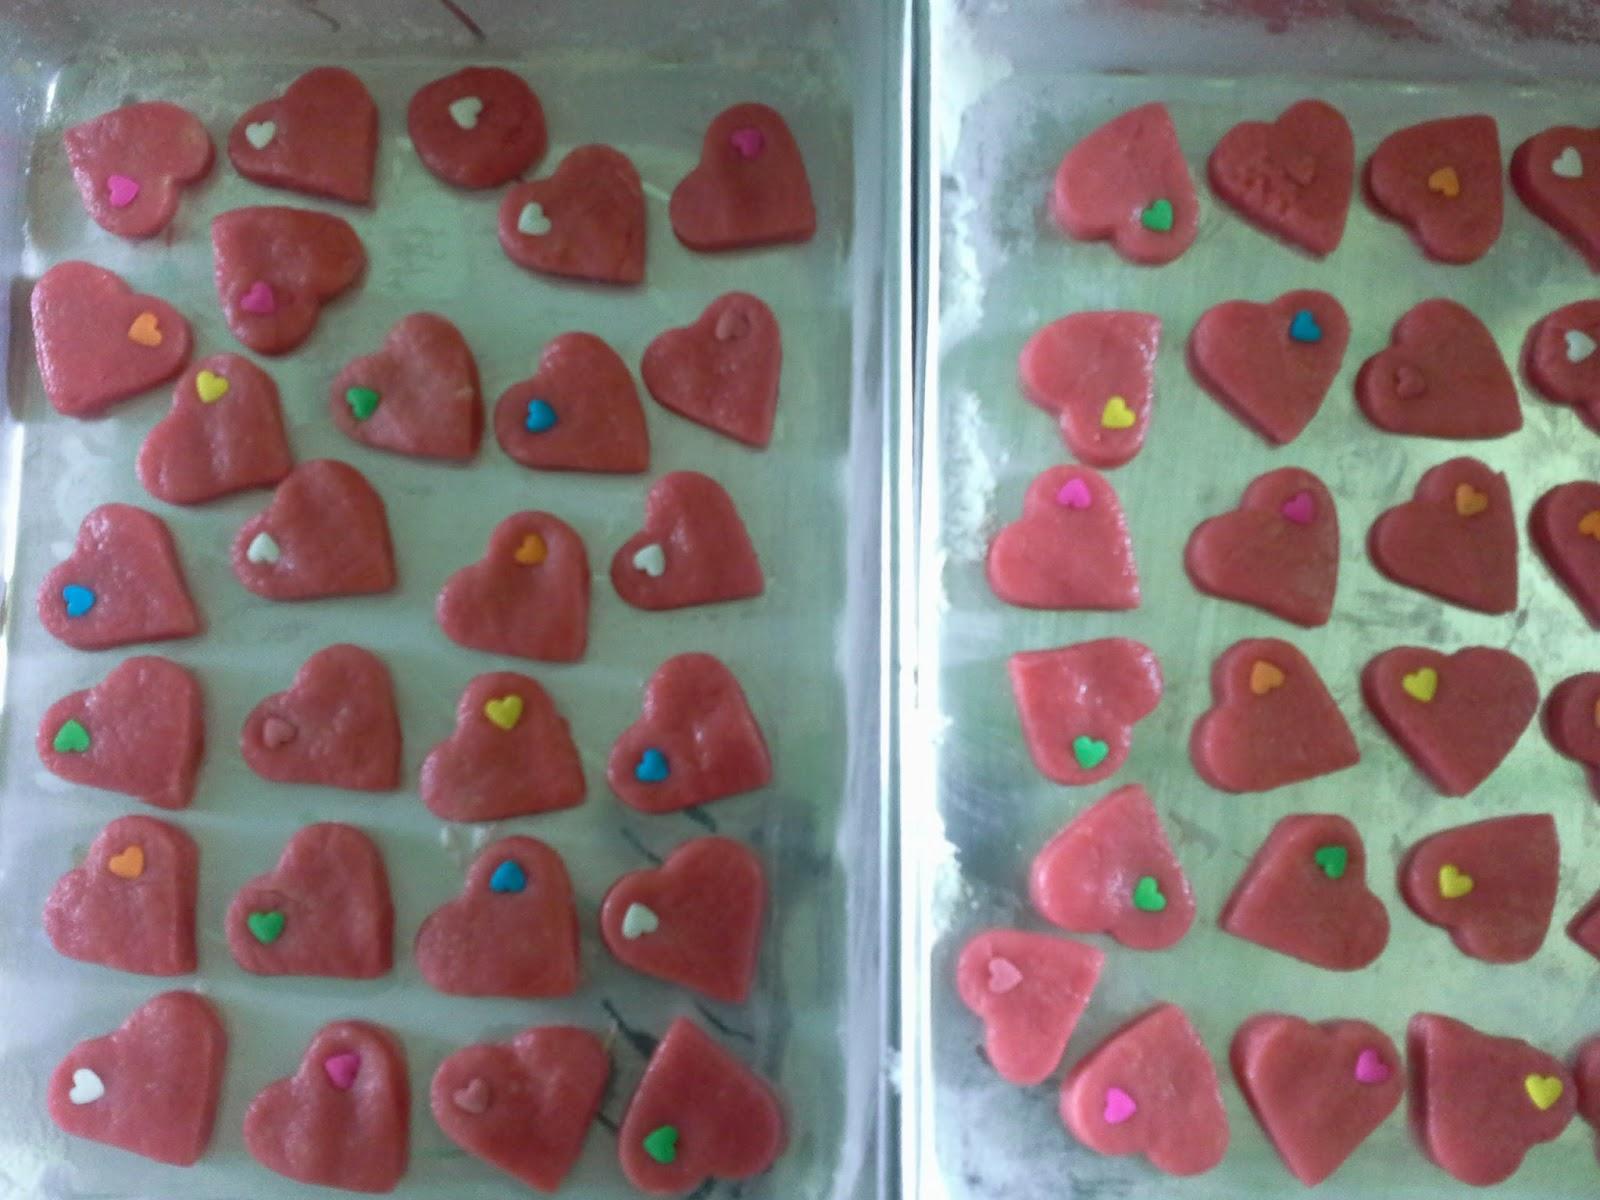 Biskut romantik cinta valentina